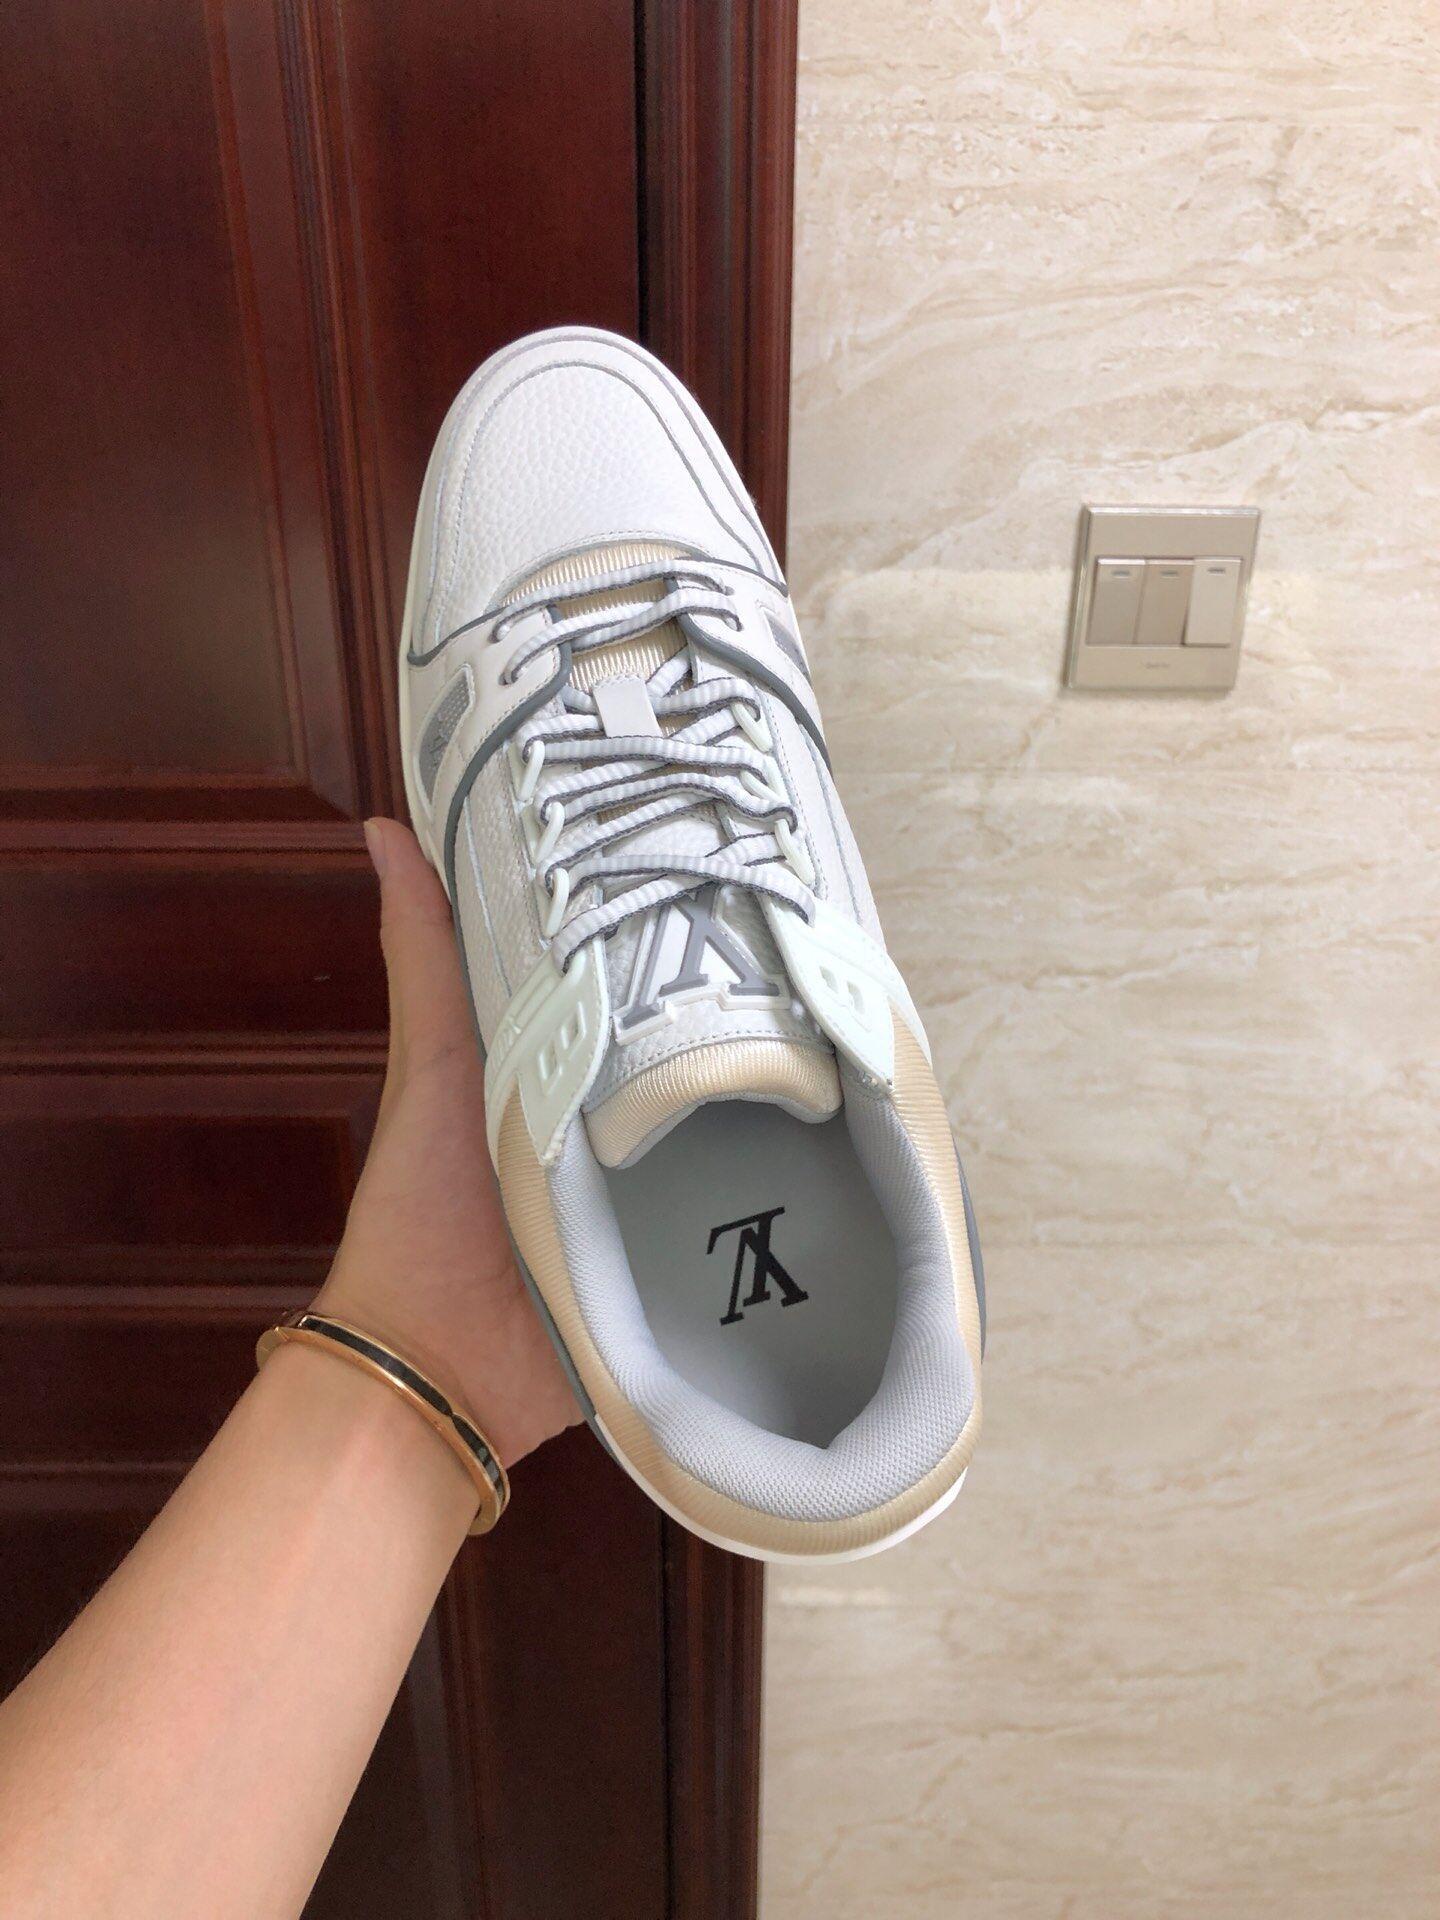 lv trainer sneaker Grained calf leather white lv sneaker 1A5PZO lv sneaker lv  10